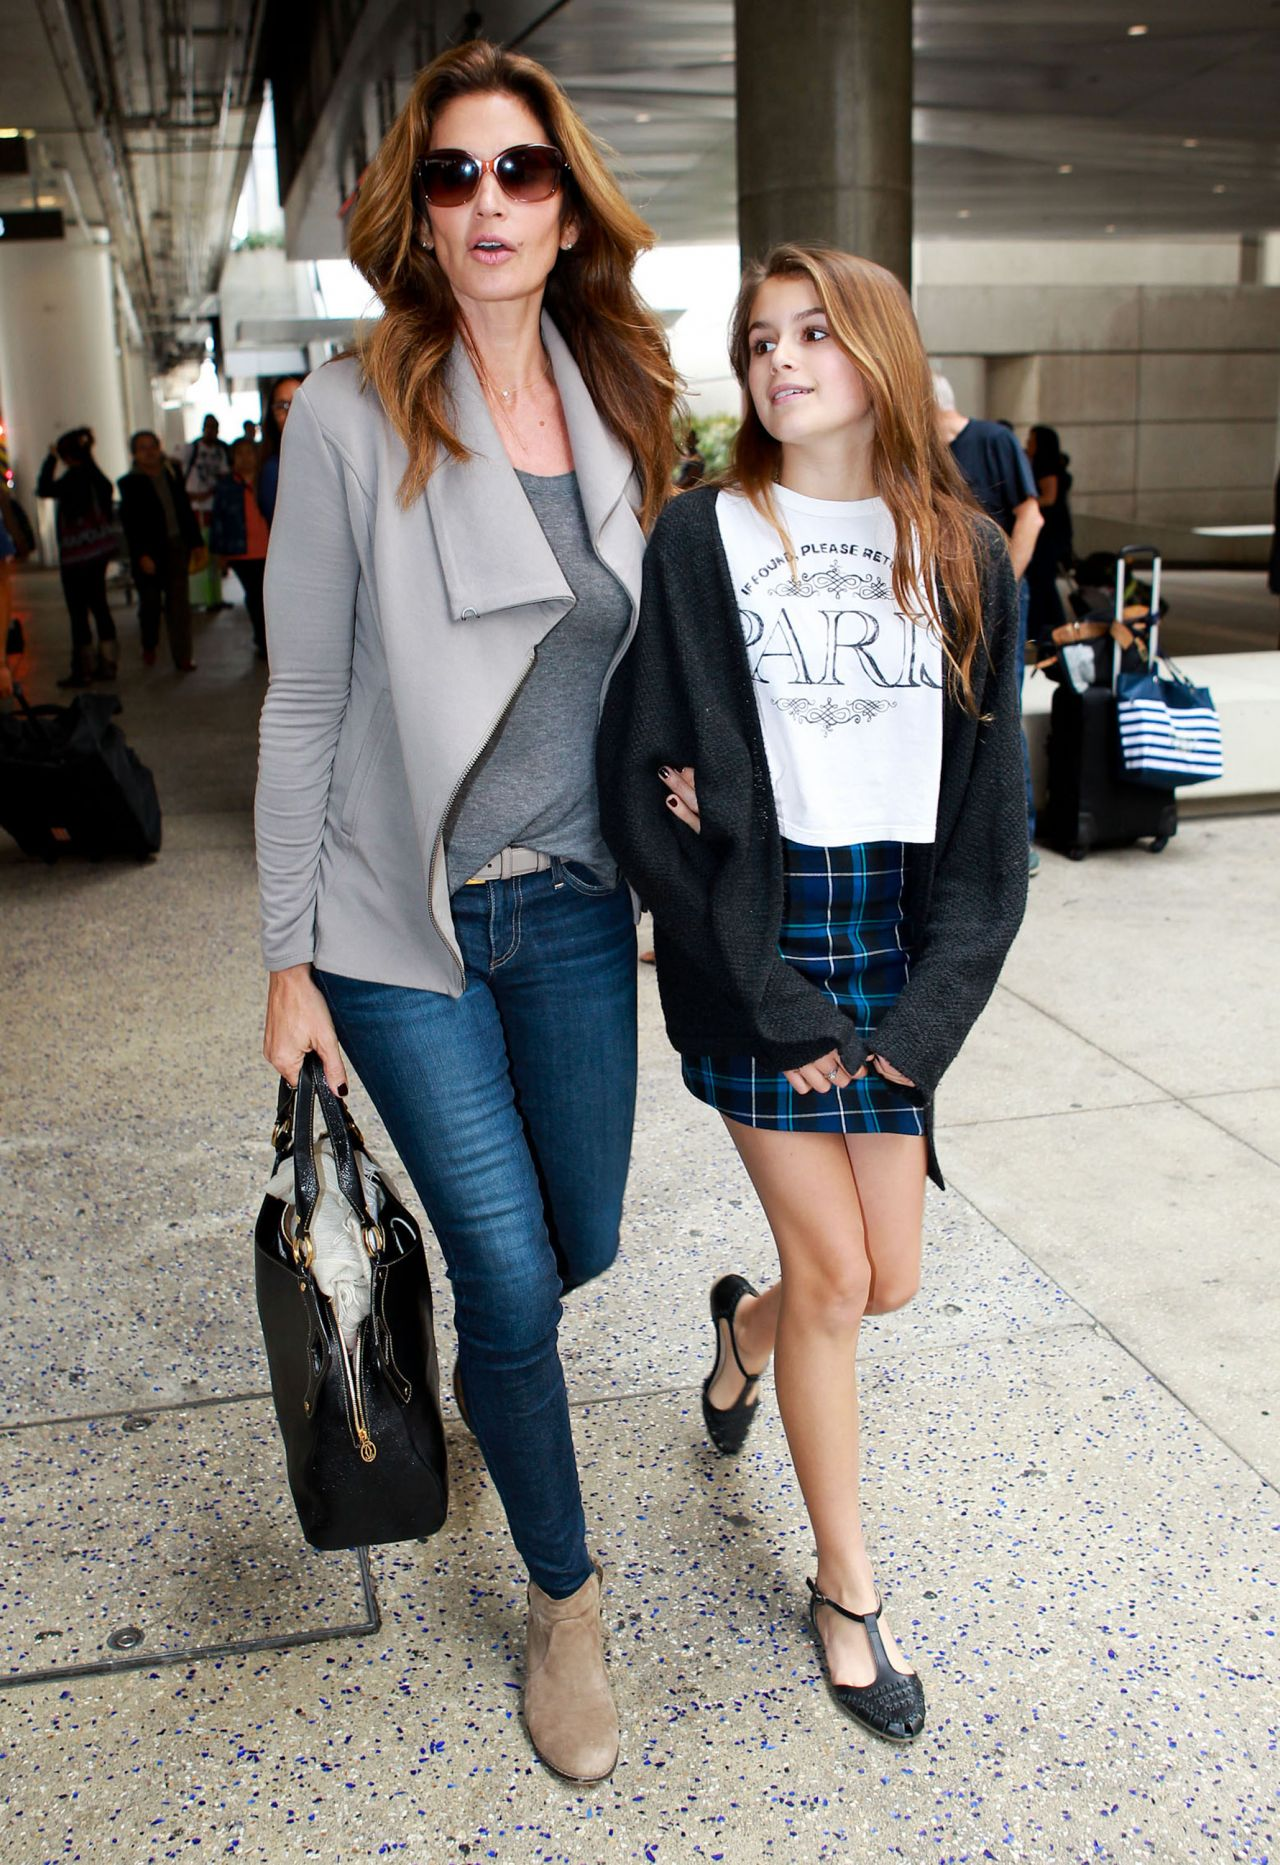 Cindy Crawford and Kaia Jordan Gerber at LAX Airport - May 2014